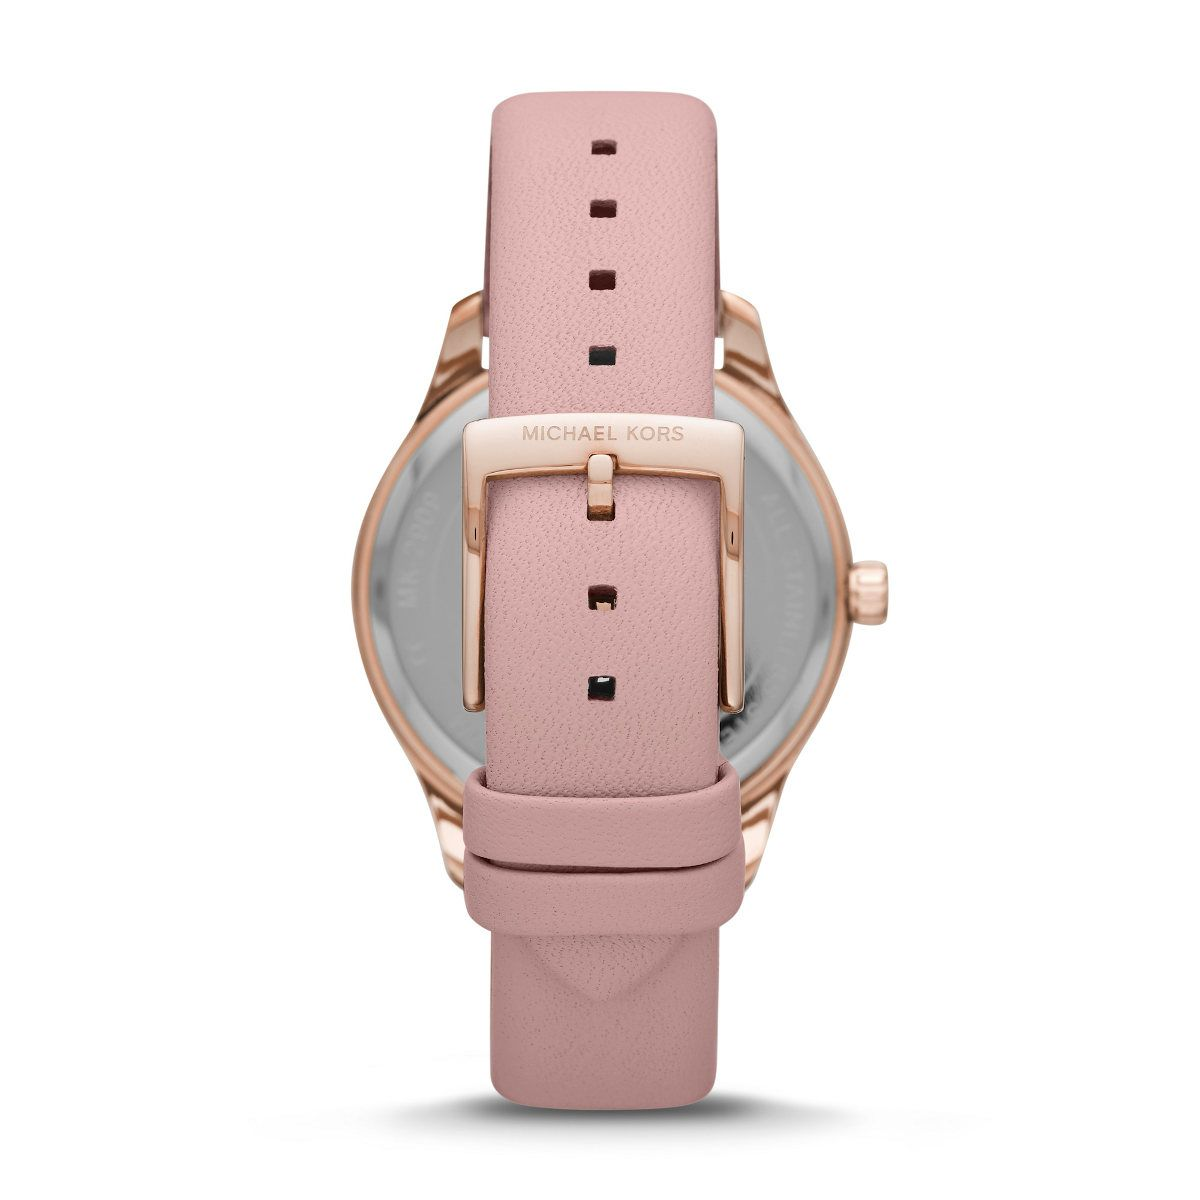 Michael Kors MK2909 damski zegarek Layton pasek